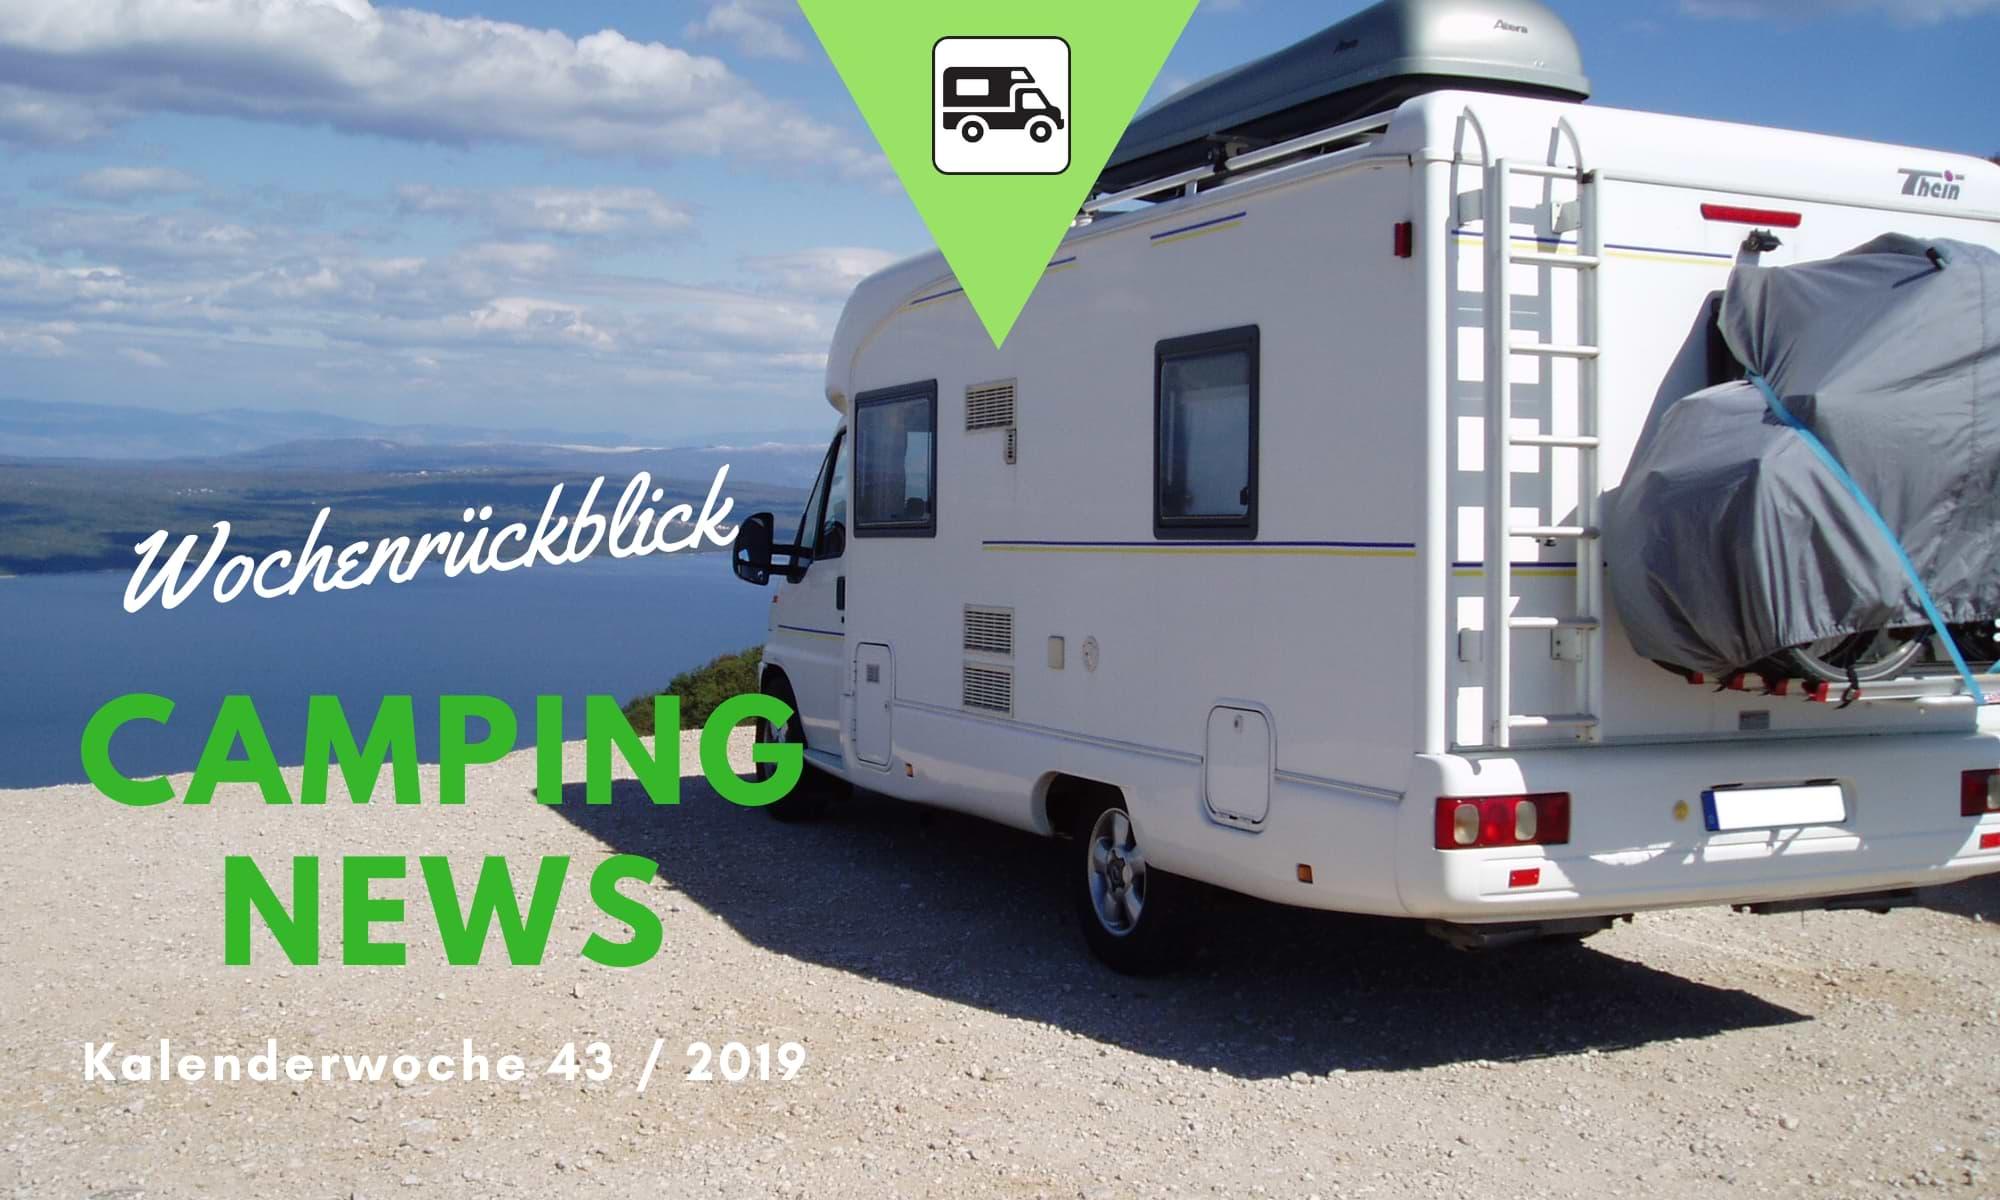 Wochenrückblick Camping News KW43-2019